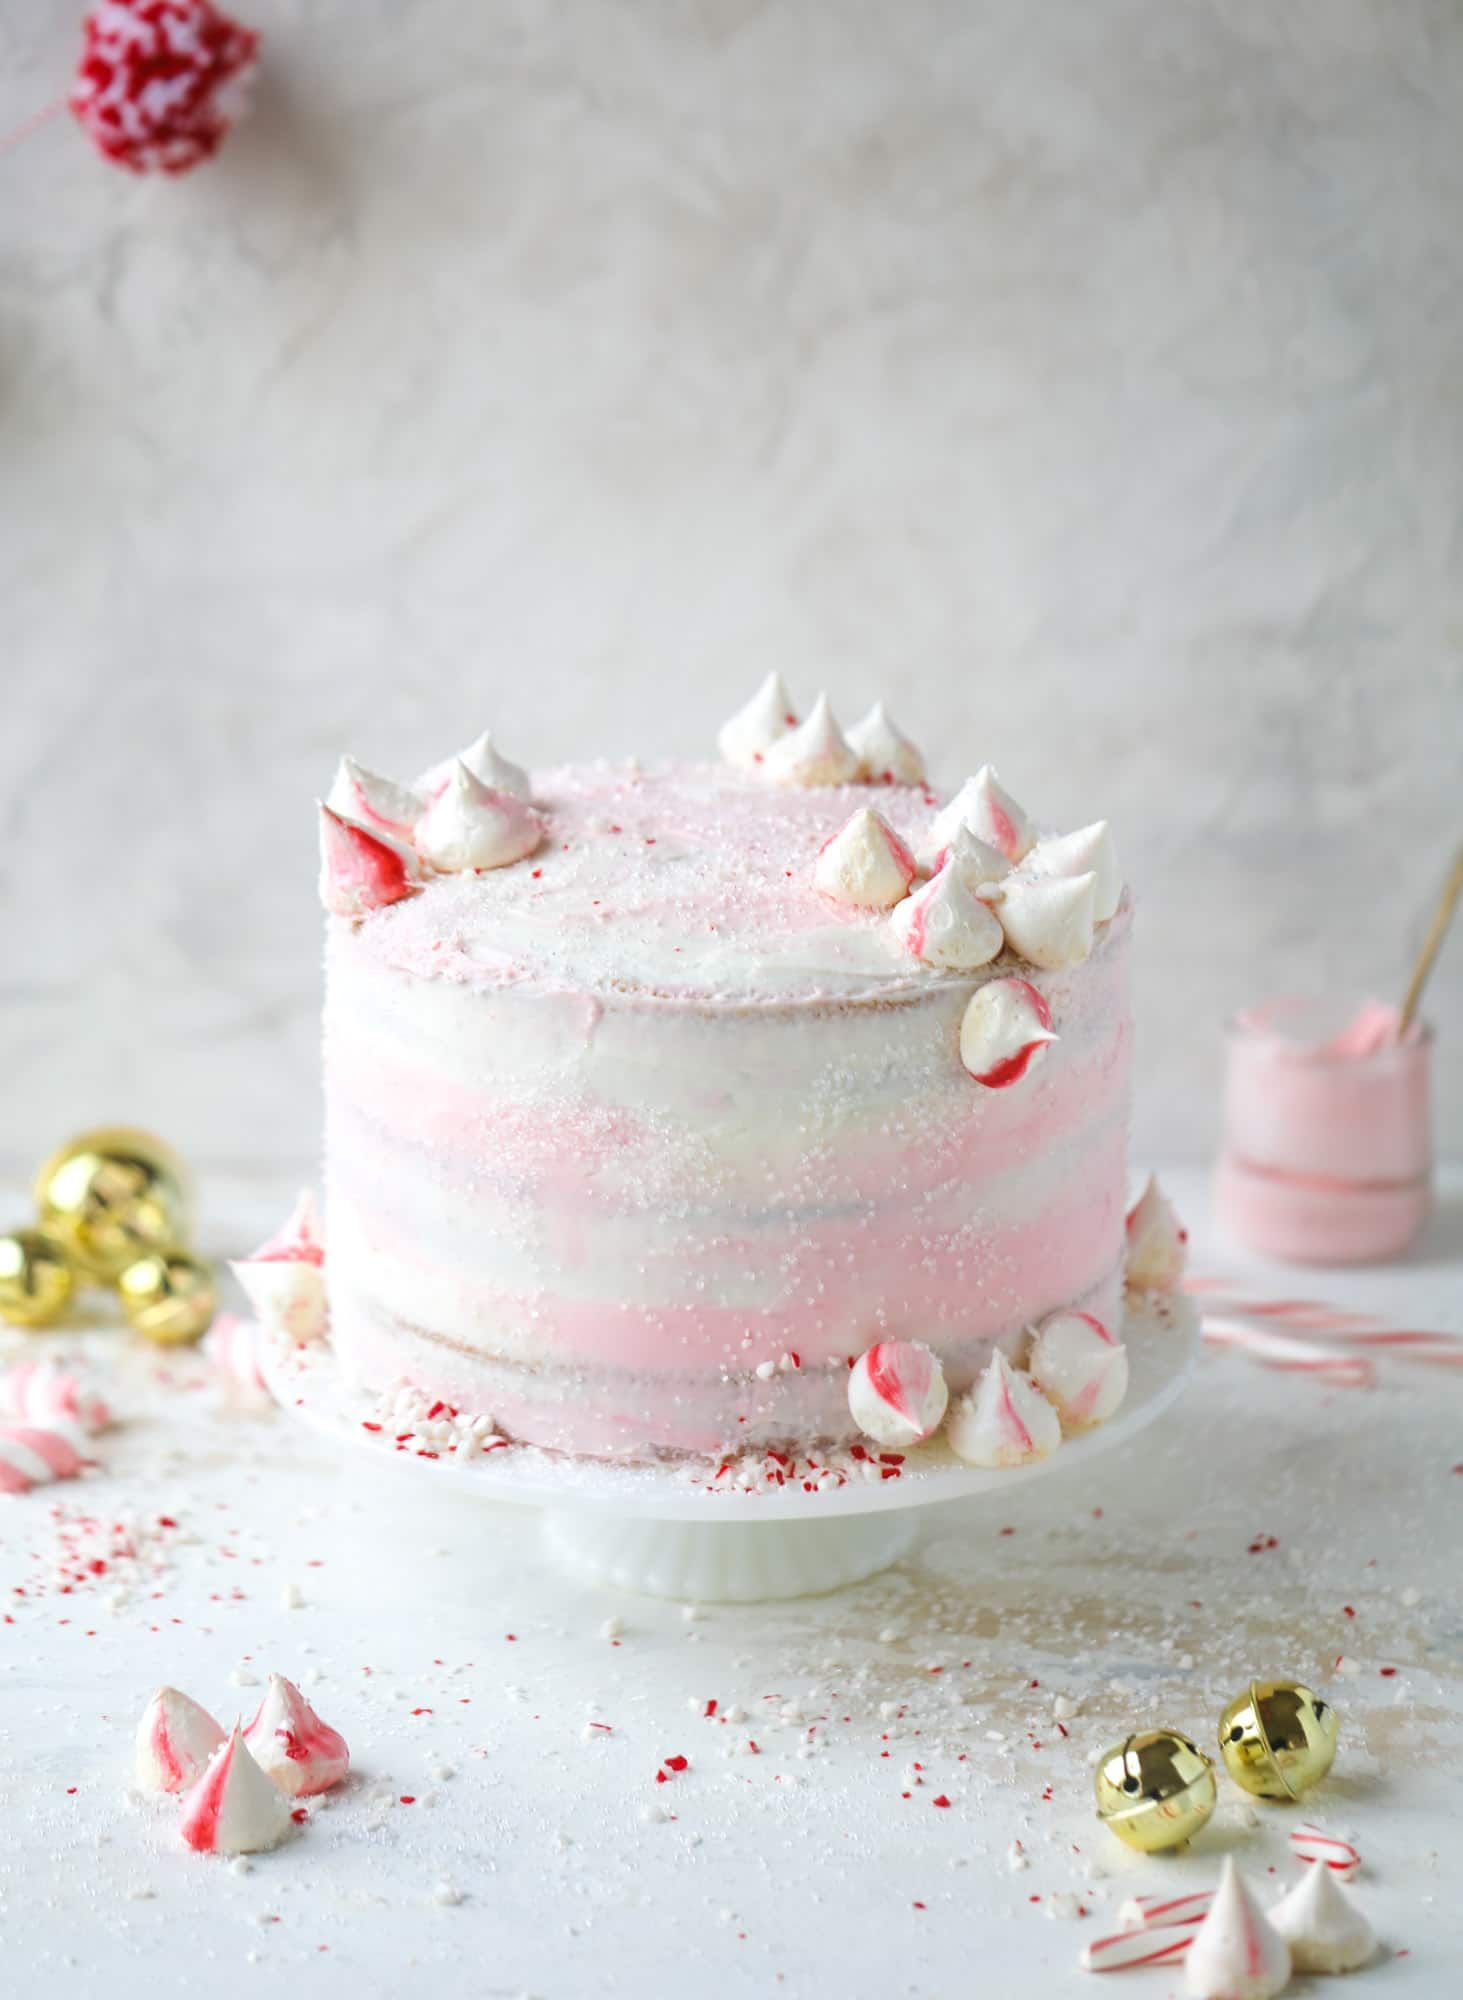 Best Christmas Cakes 2021 58 Best Christmas Cake Recipes Easy Christmas Cake Ideas